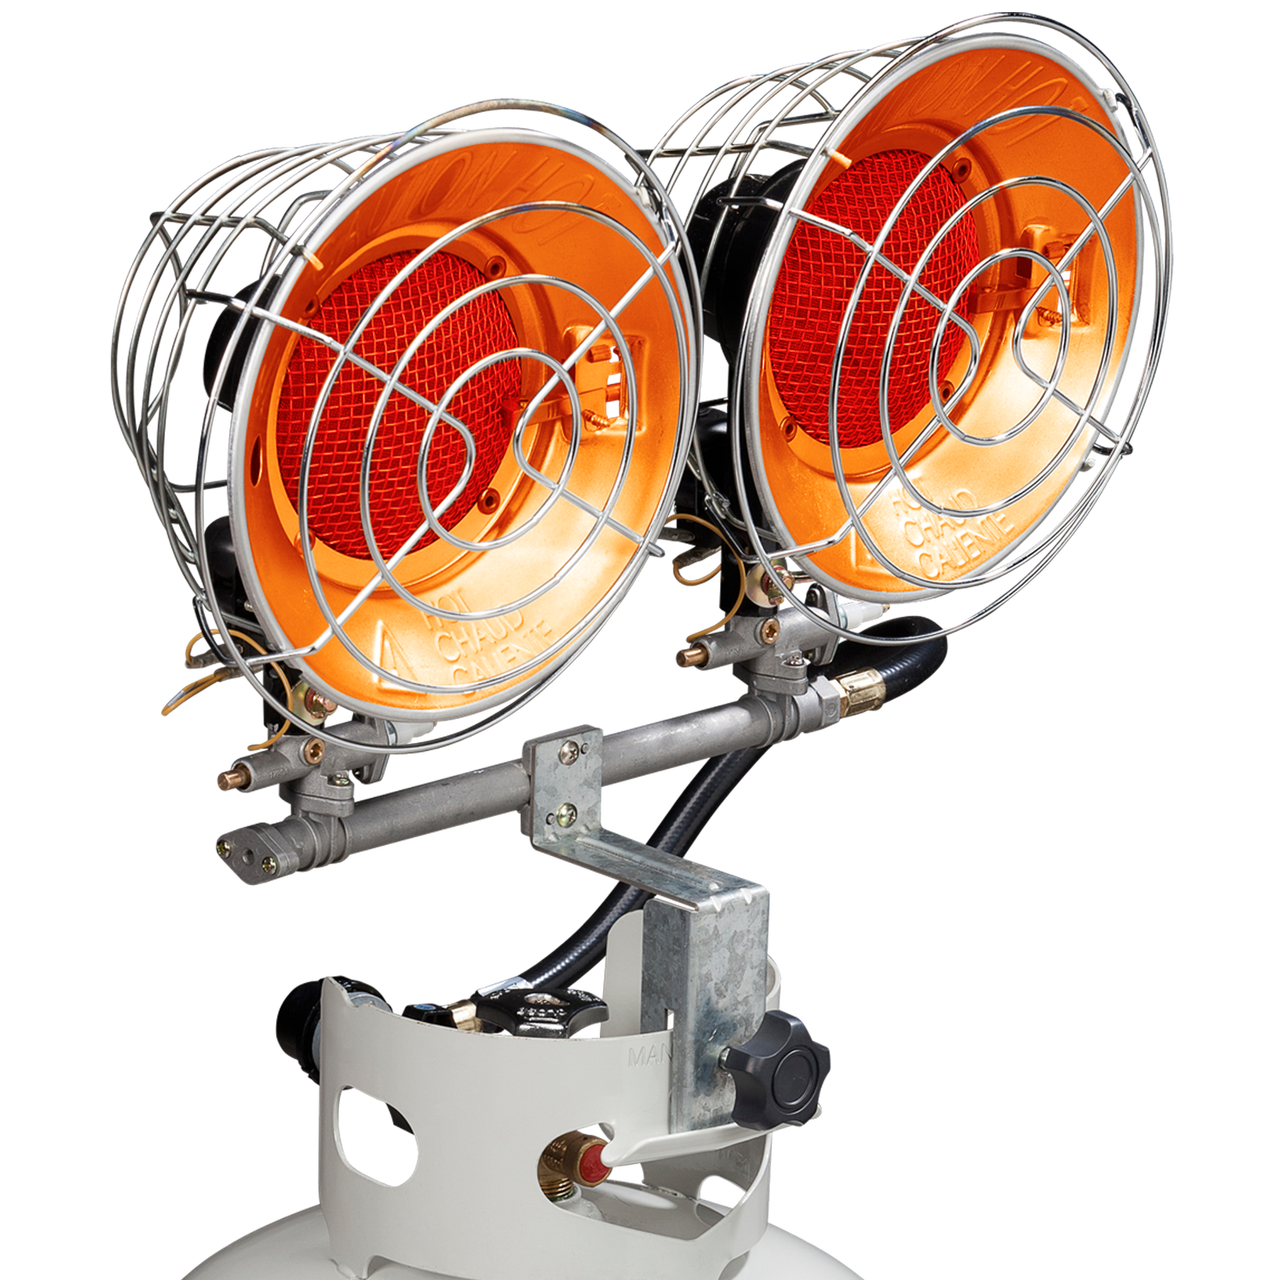 Tank Top Propane Heater – 30,000 BTU, Model#: PCTT30